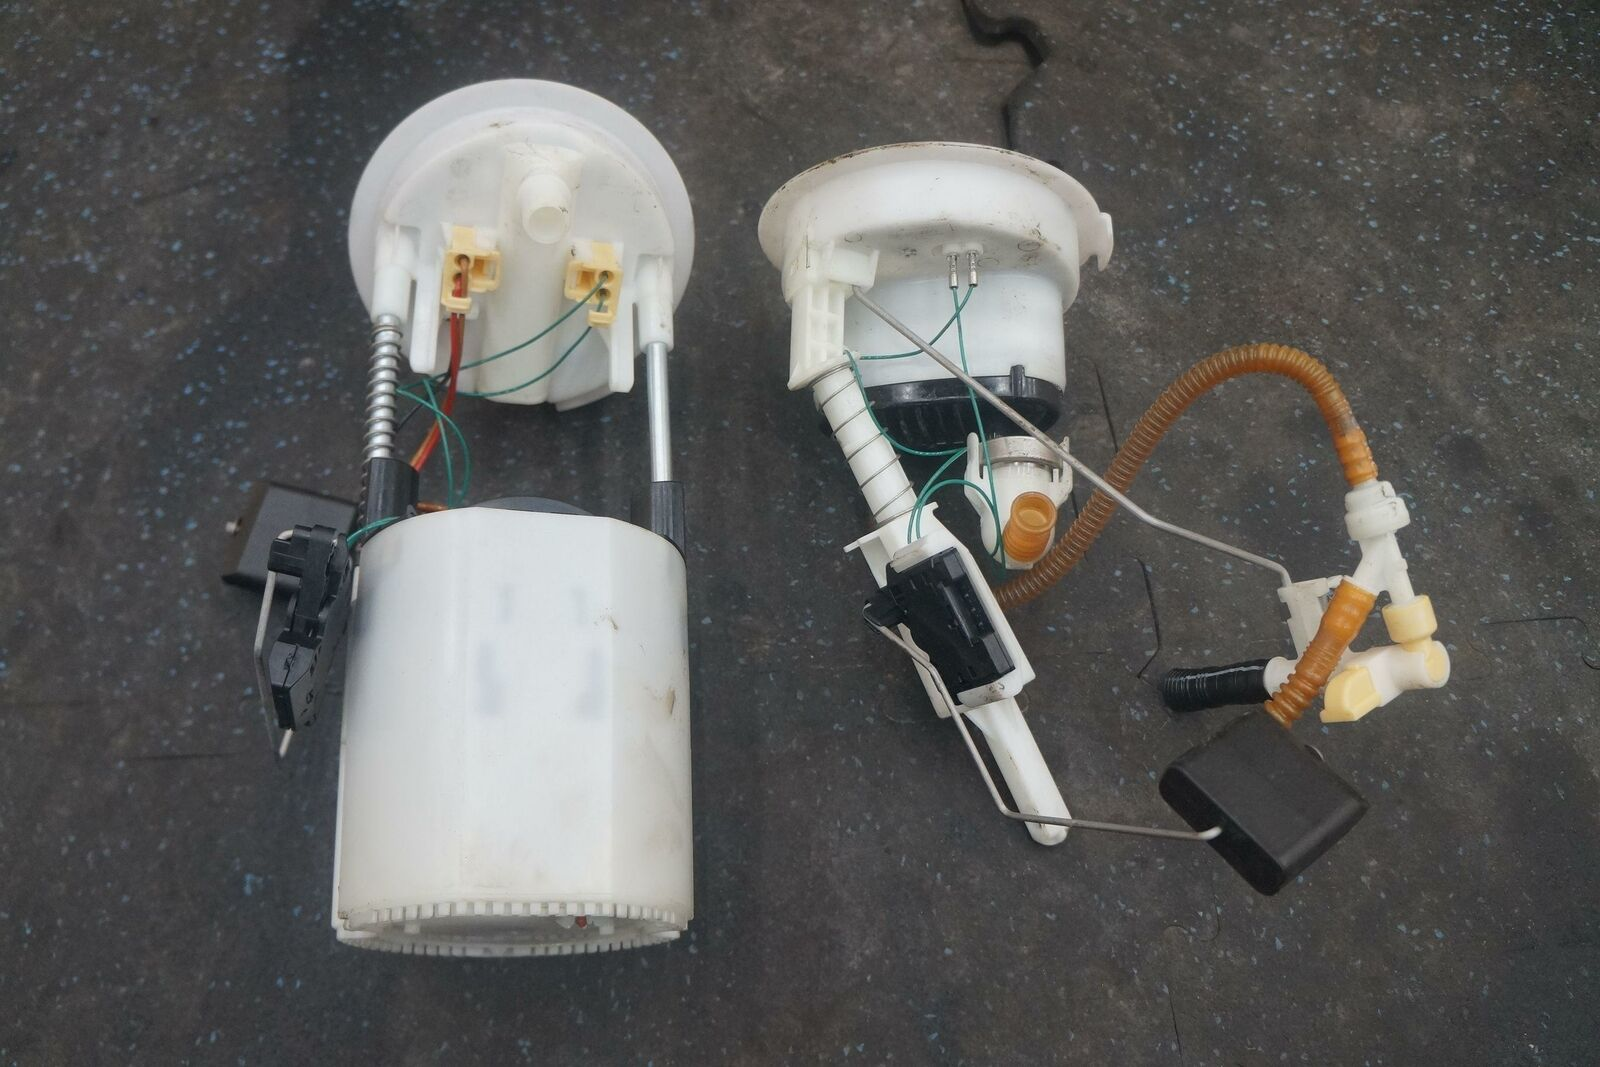 gasoline gas fuel tank pump sender module set 16147163298 oem bmw x1 e84 2012 15 pacific motors. Black Bedroom Furniture Sets. Home Design Ideas